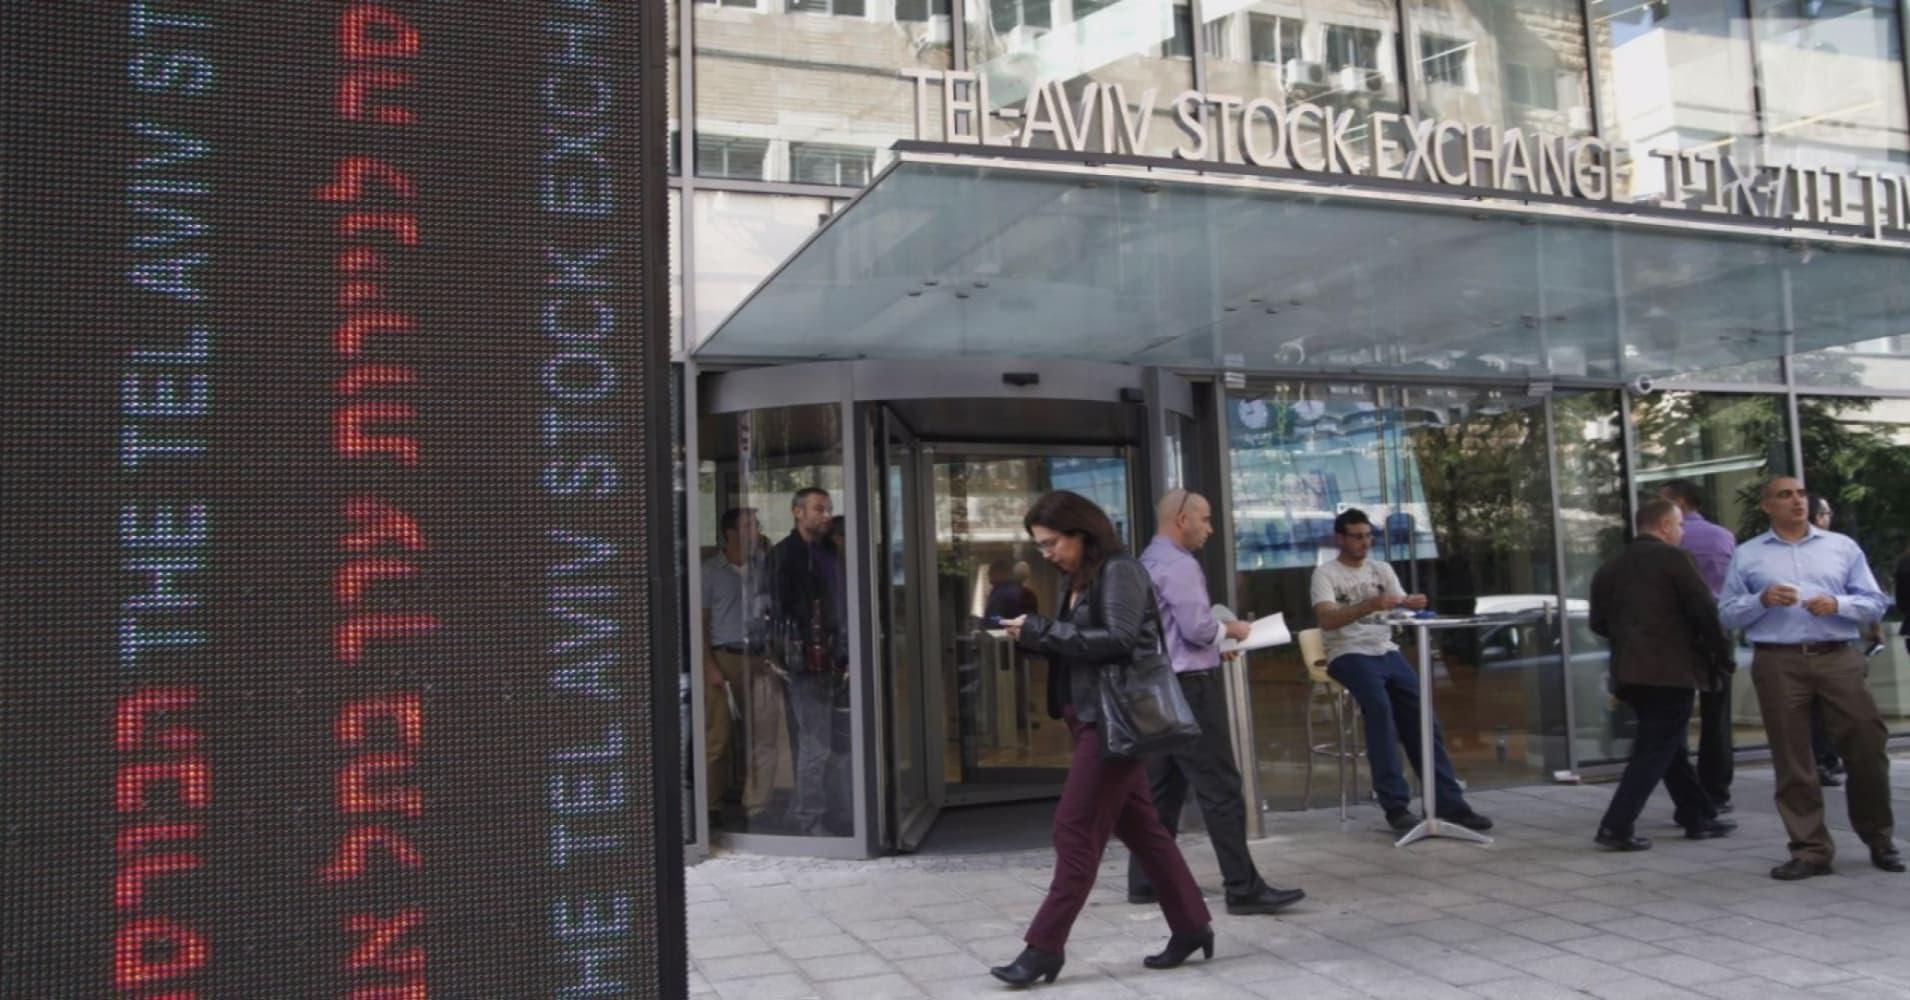 Israeli regulator wants to ban crypto companies from the Tel Aviv Stock Exchange